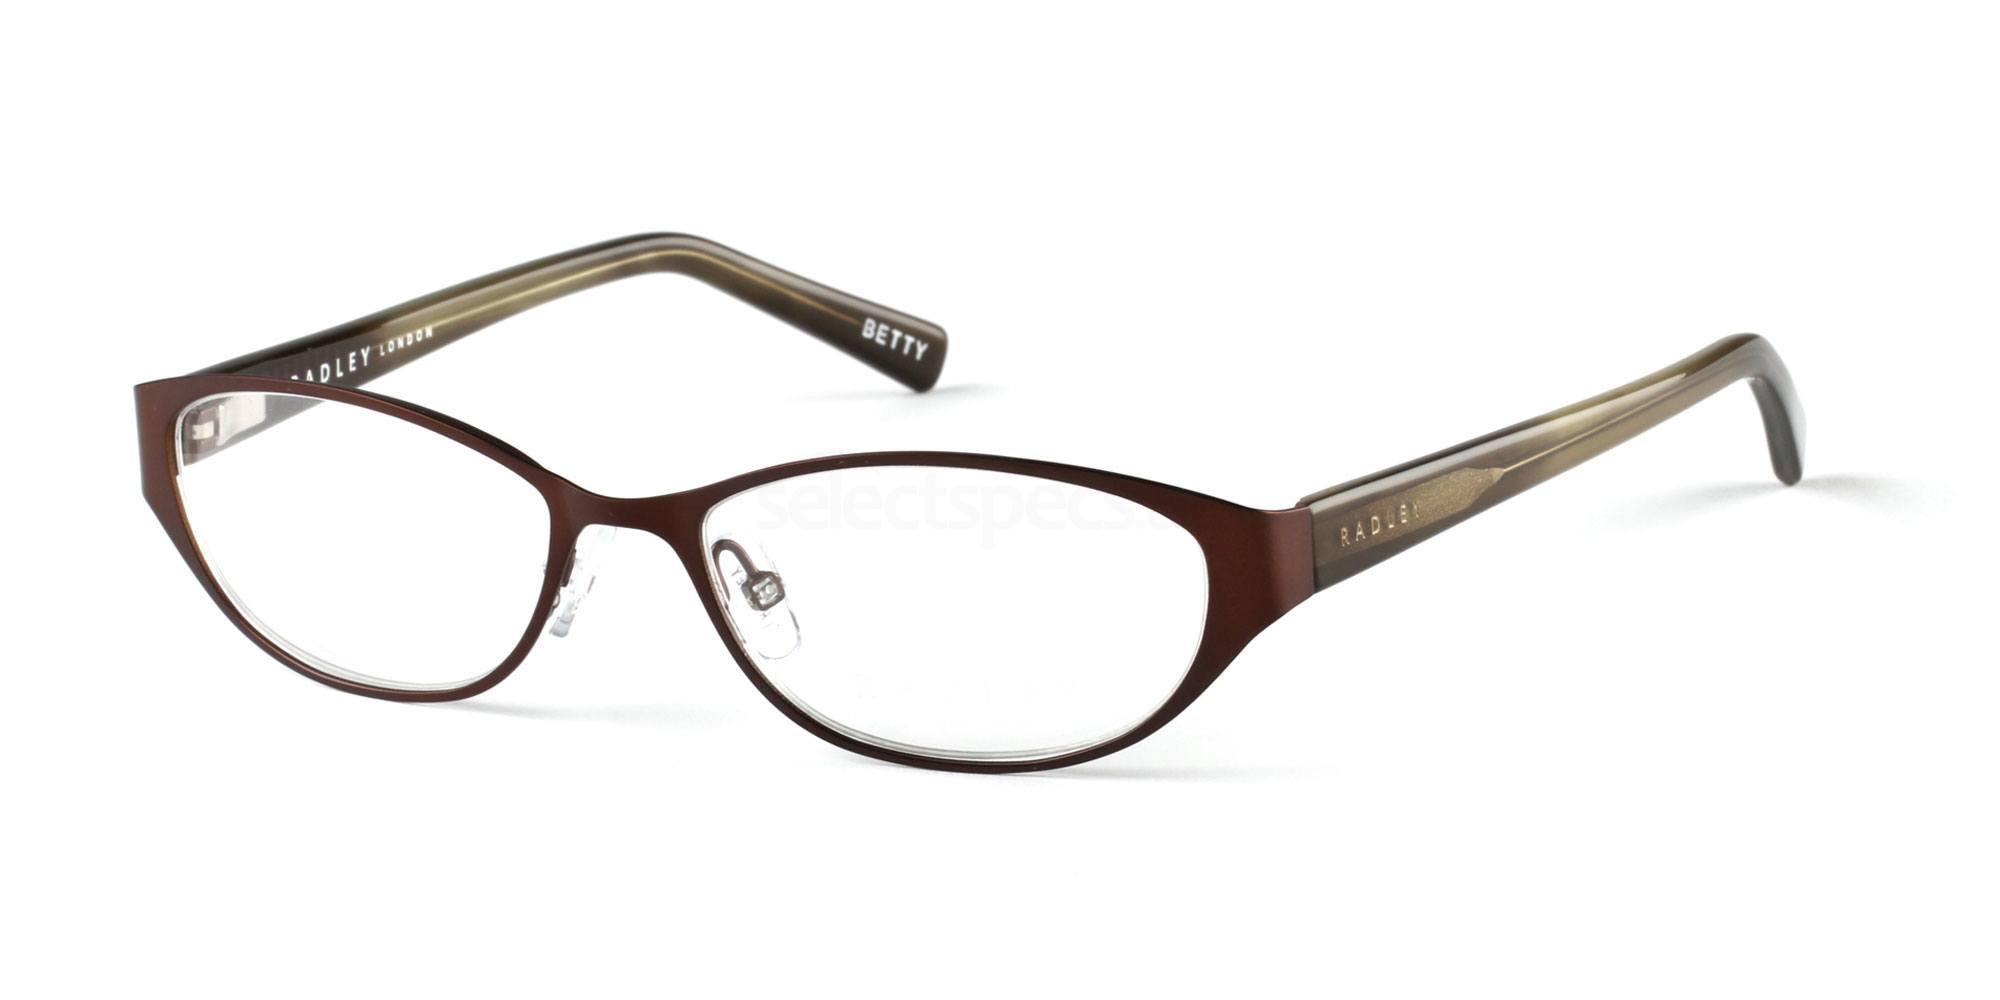 003 RDO-BETTY Glasses, Radley London